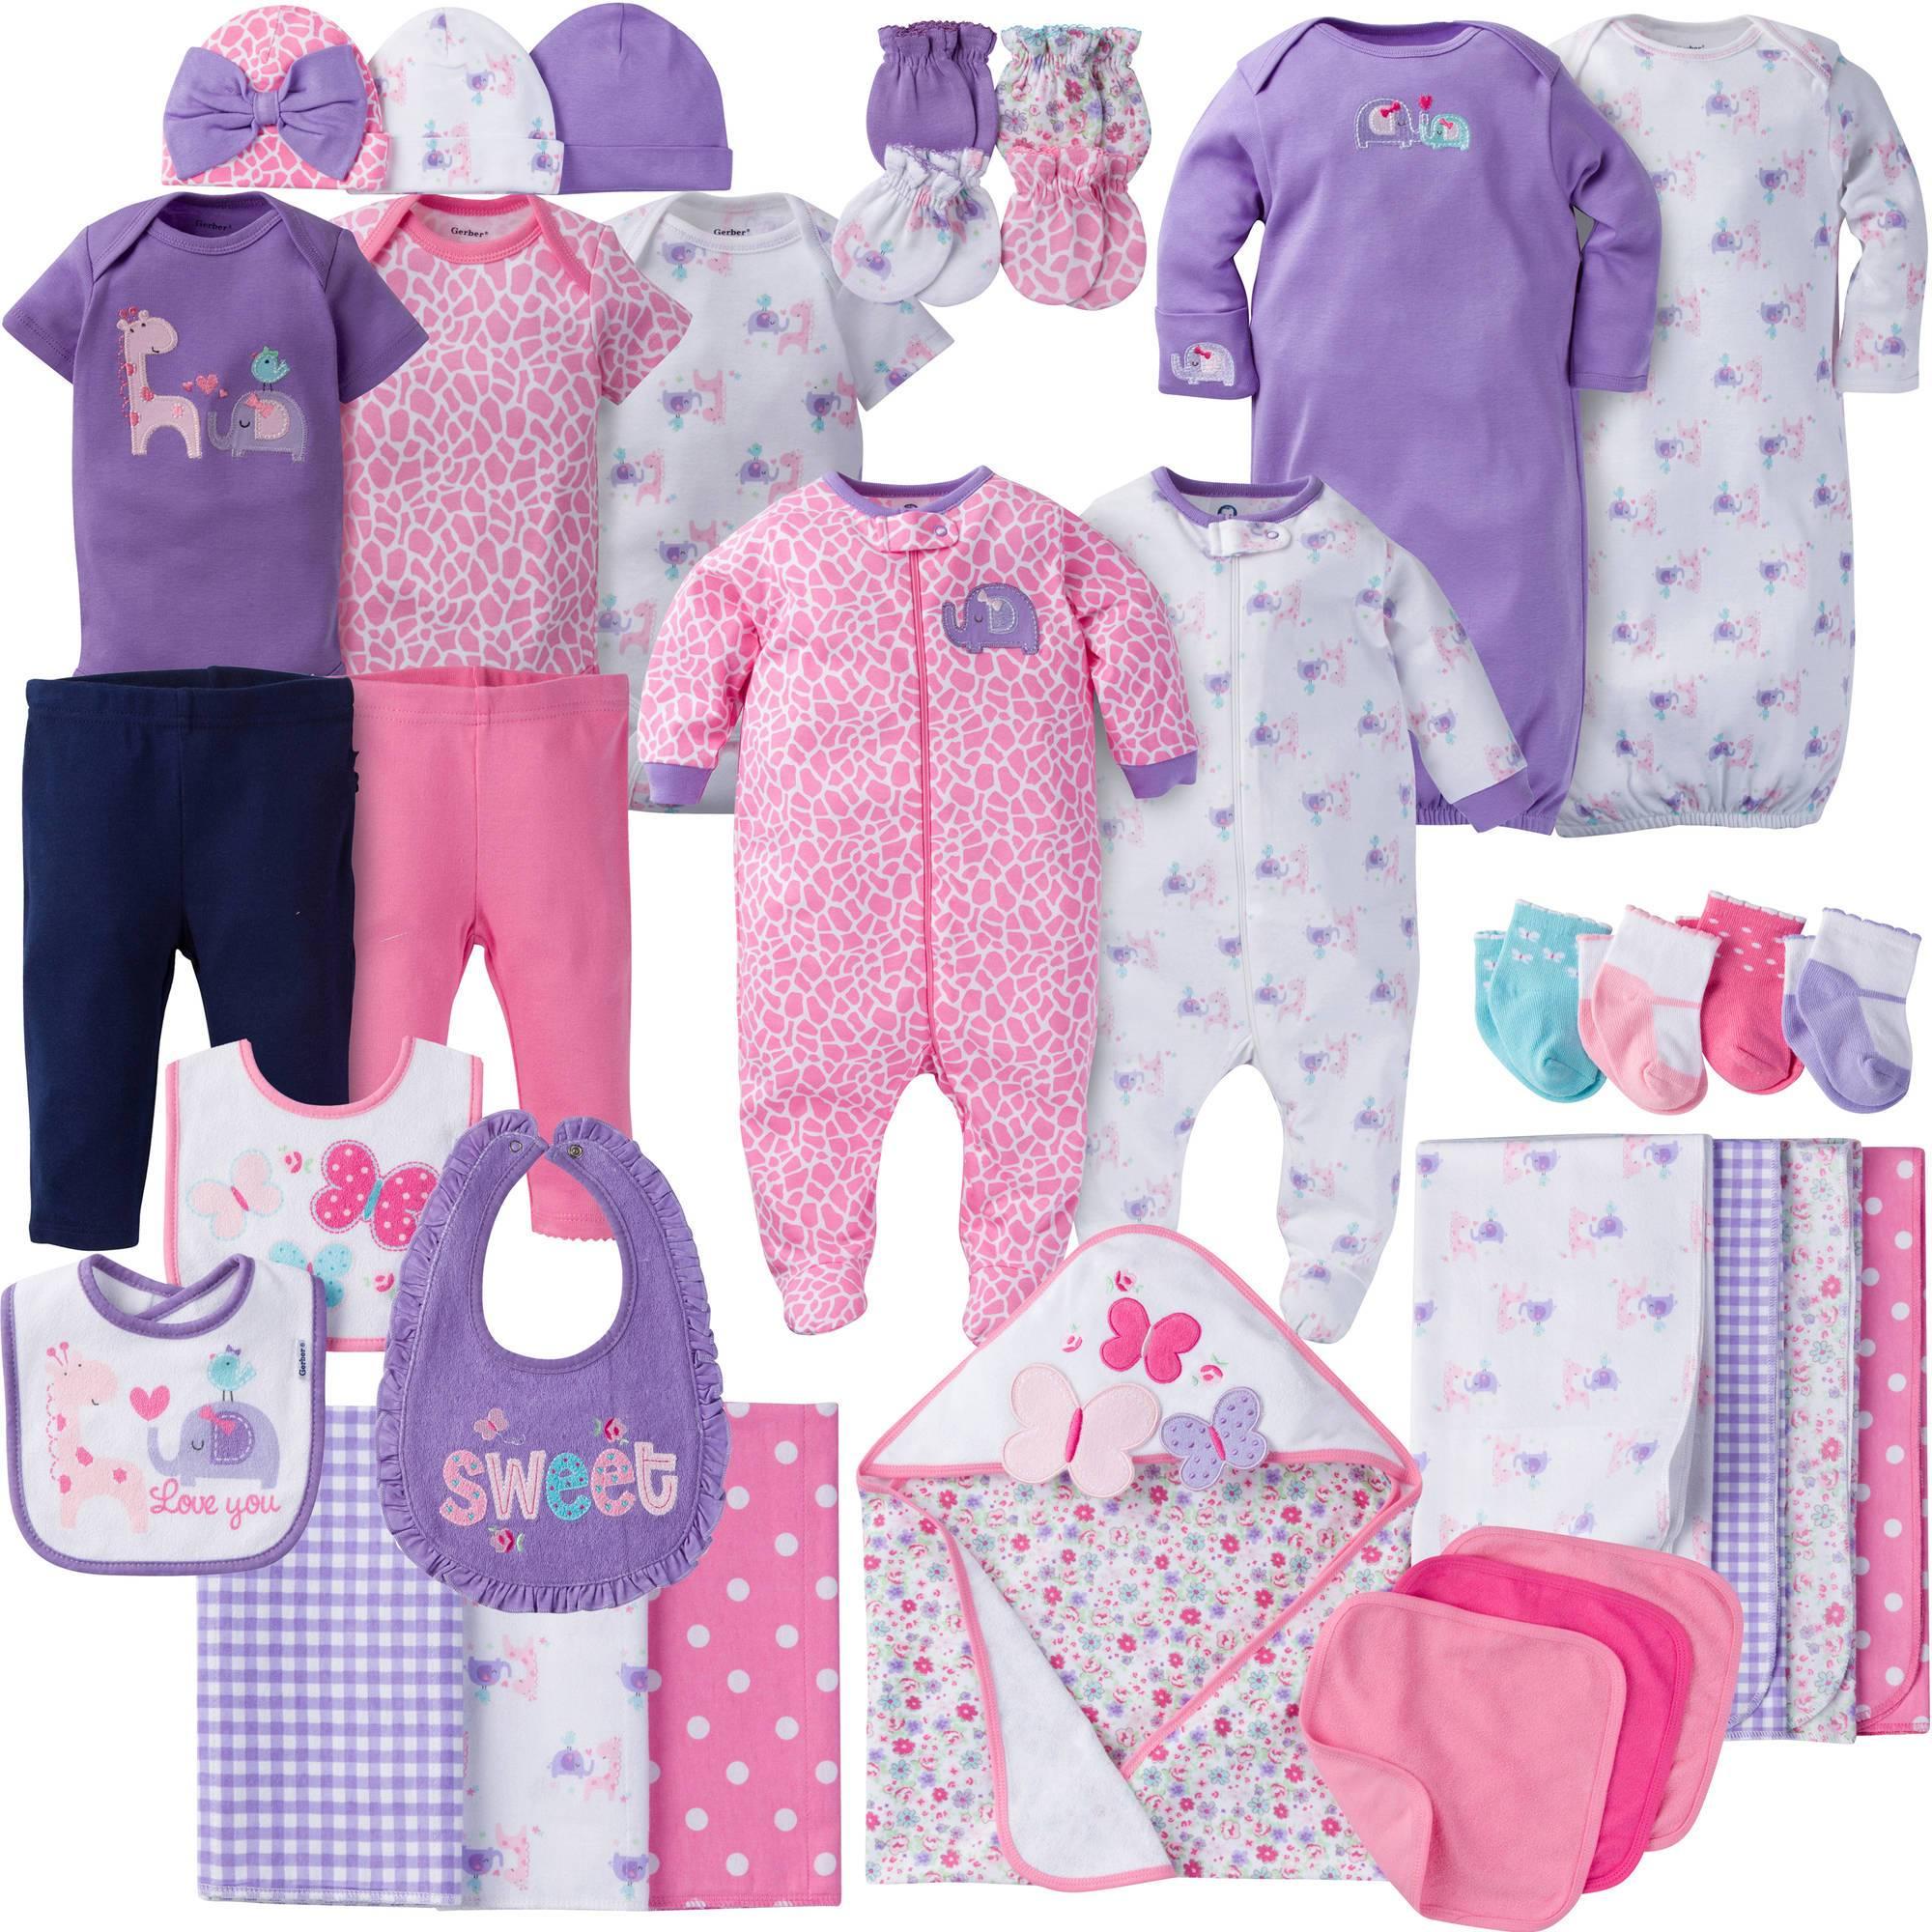 Gerber newborn baby girl perfect baby shower gift layette